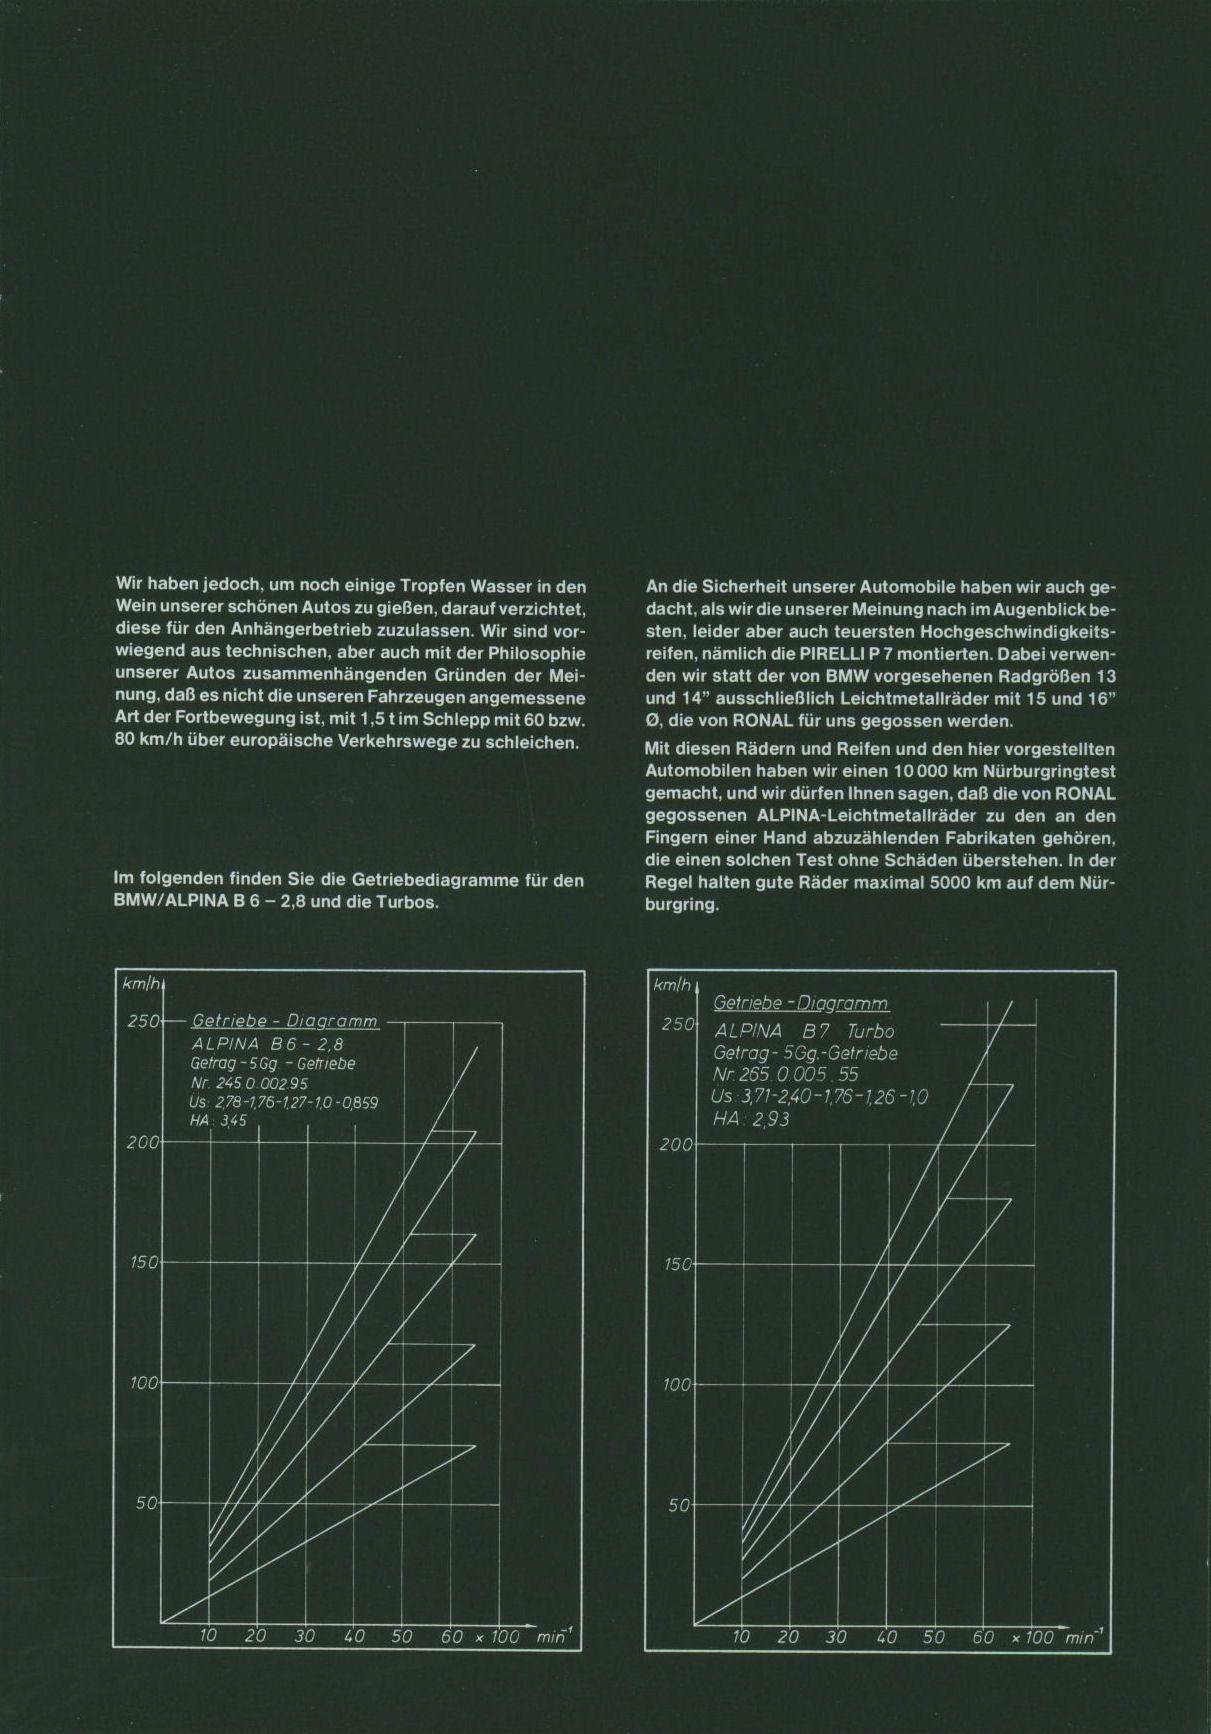 BMW Alpina brochure